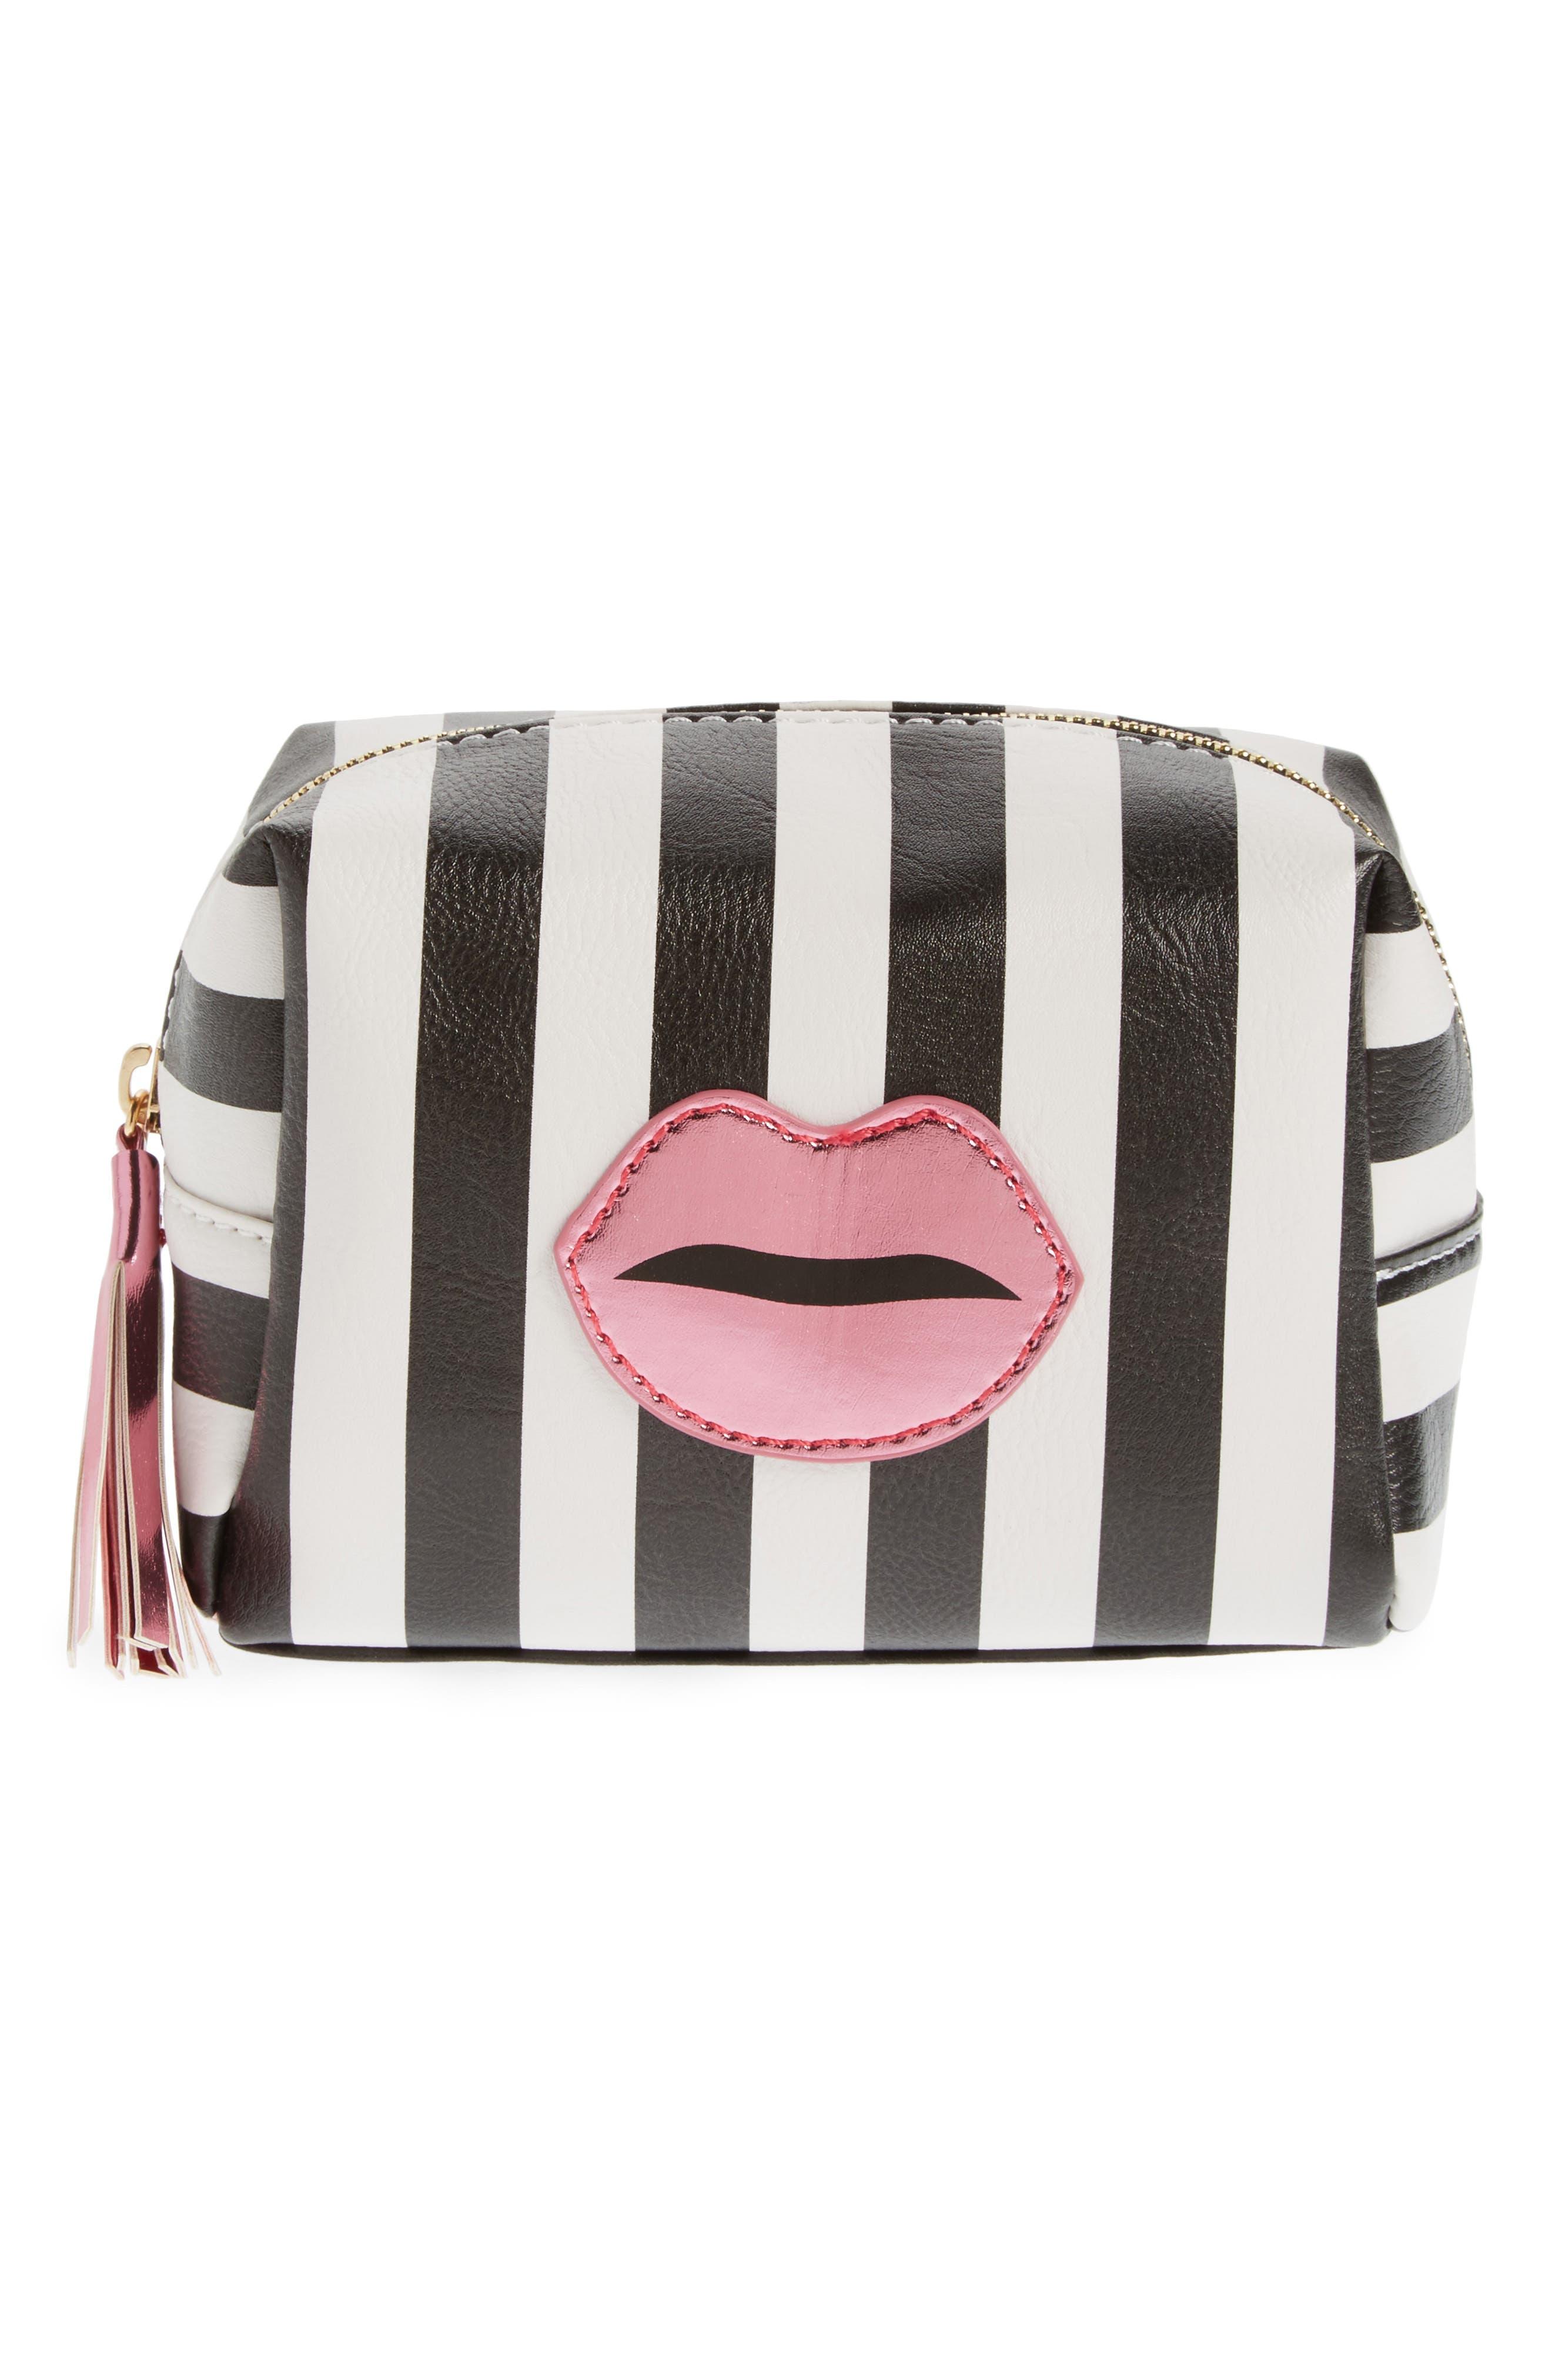 Main Image - OMG Metallic Lip Stripe Cosmetics Bag